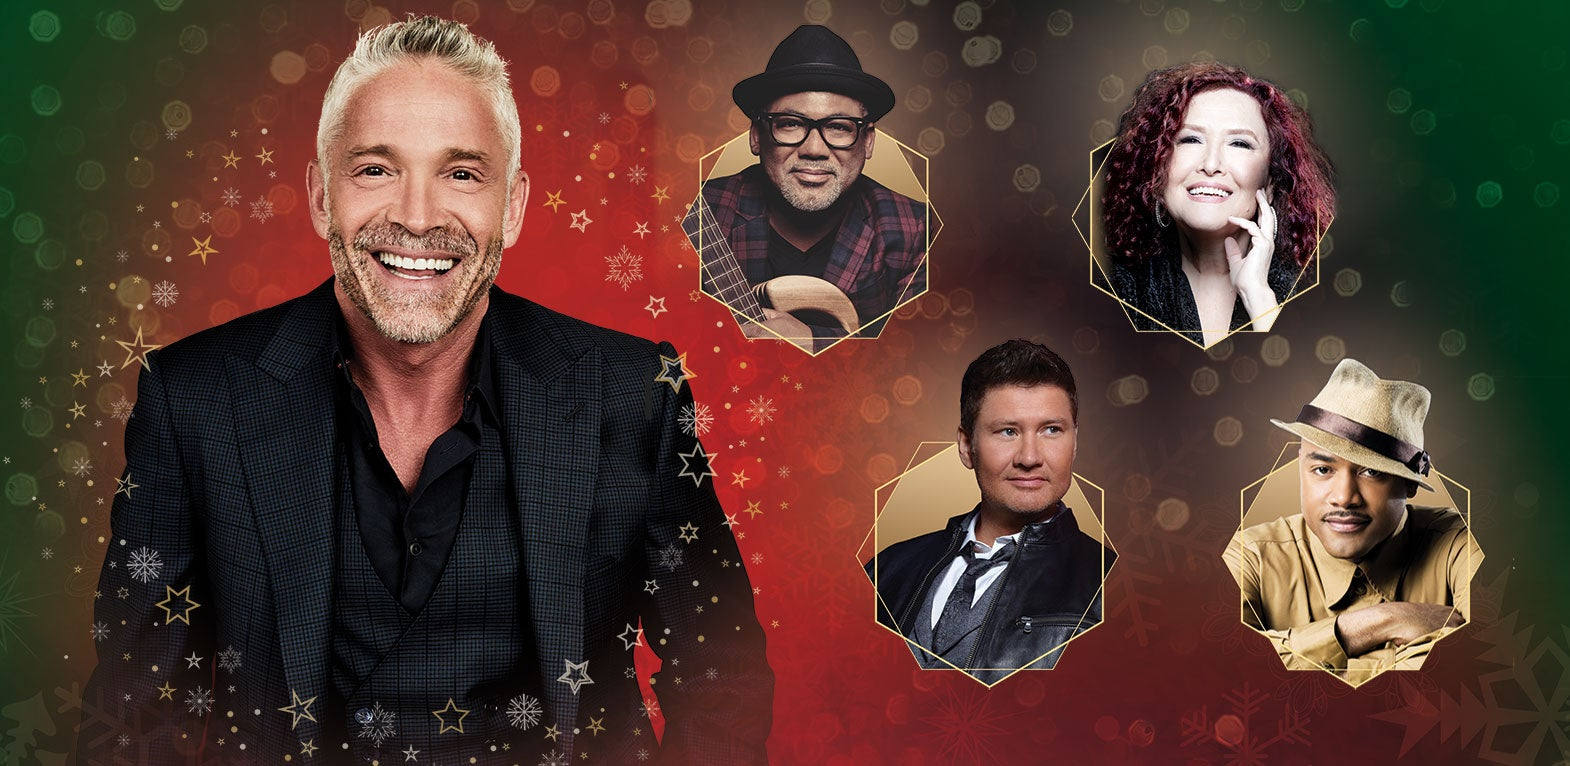 Dave Koz and Friends Christmas Tour 2019   Concierge Services of